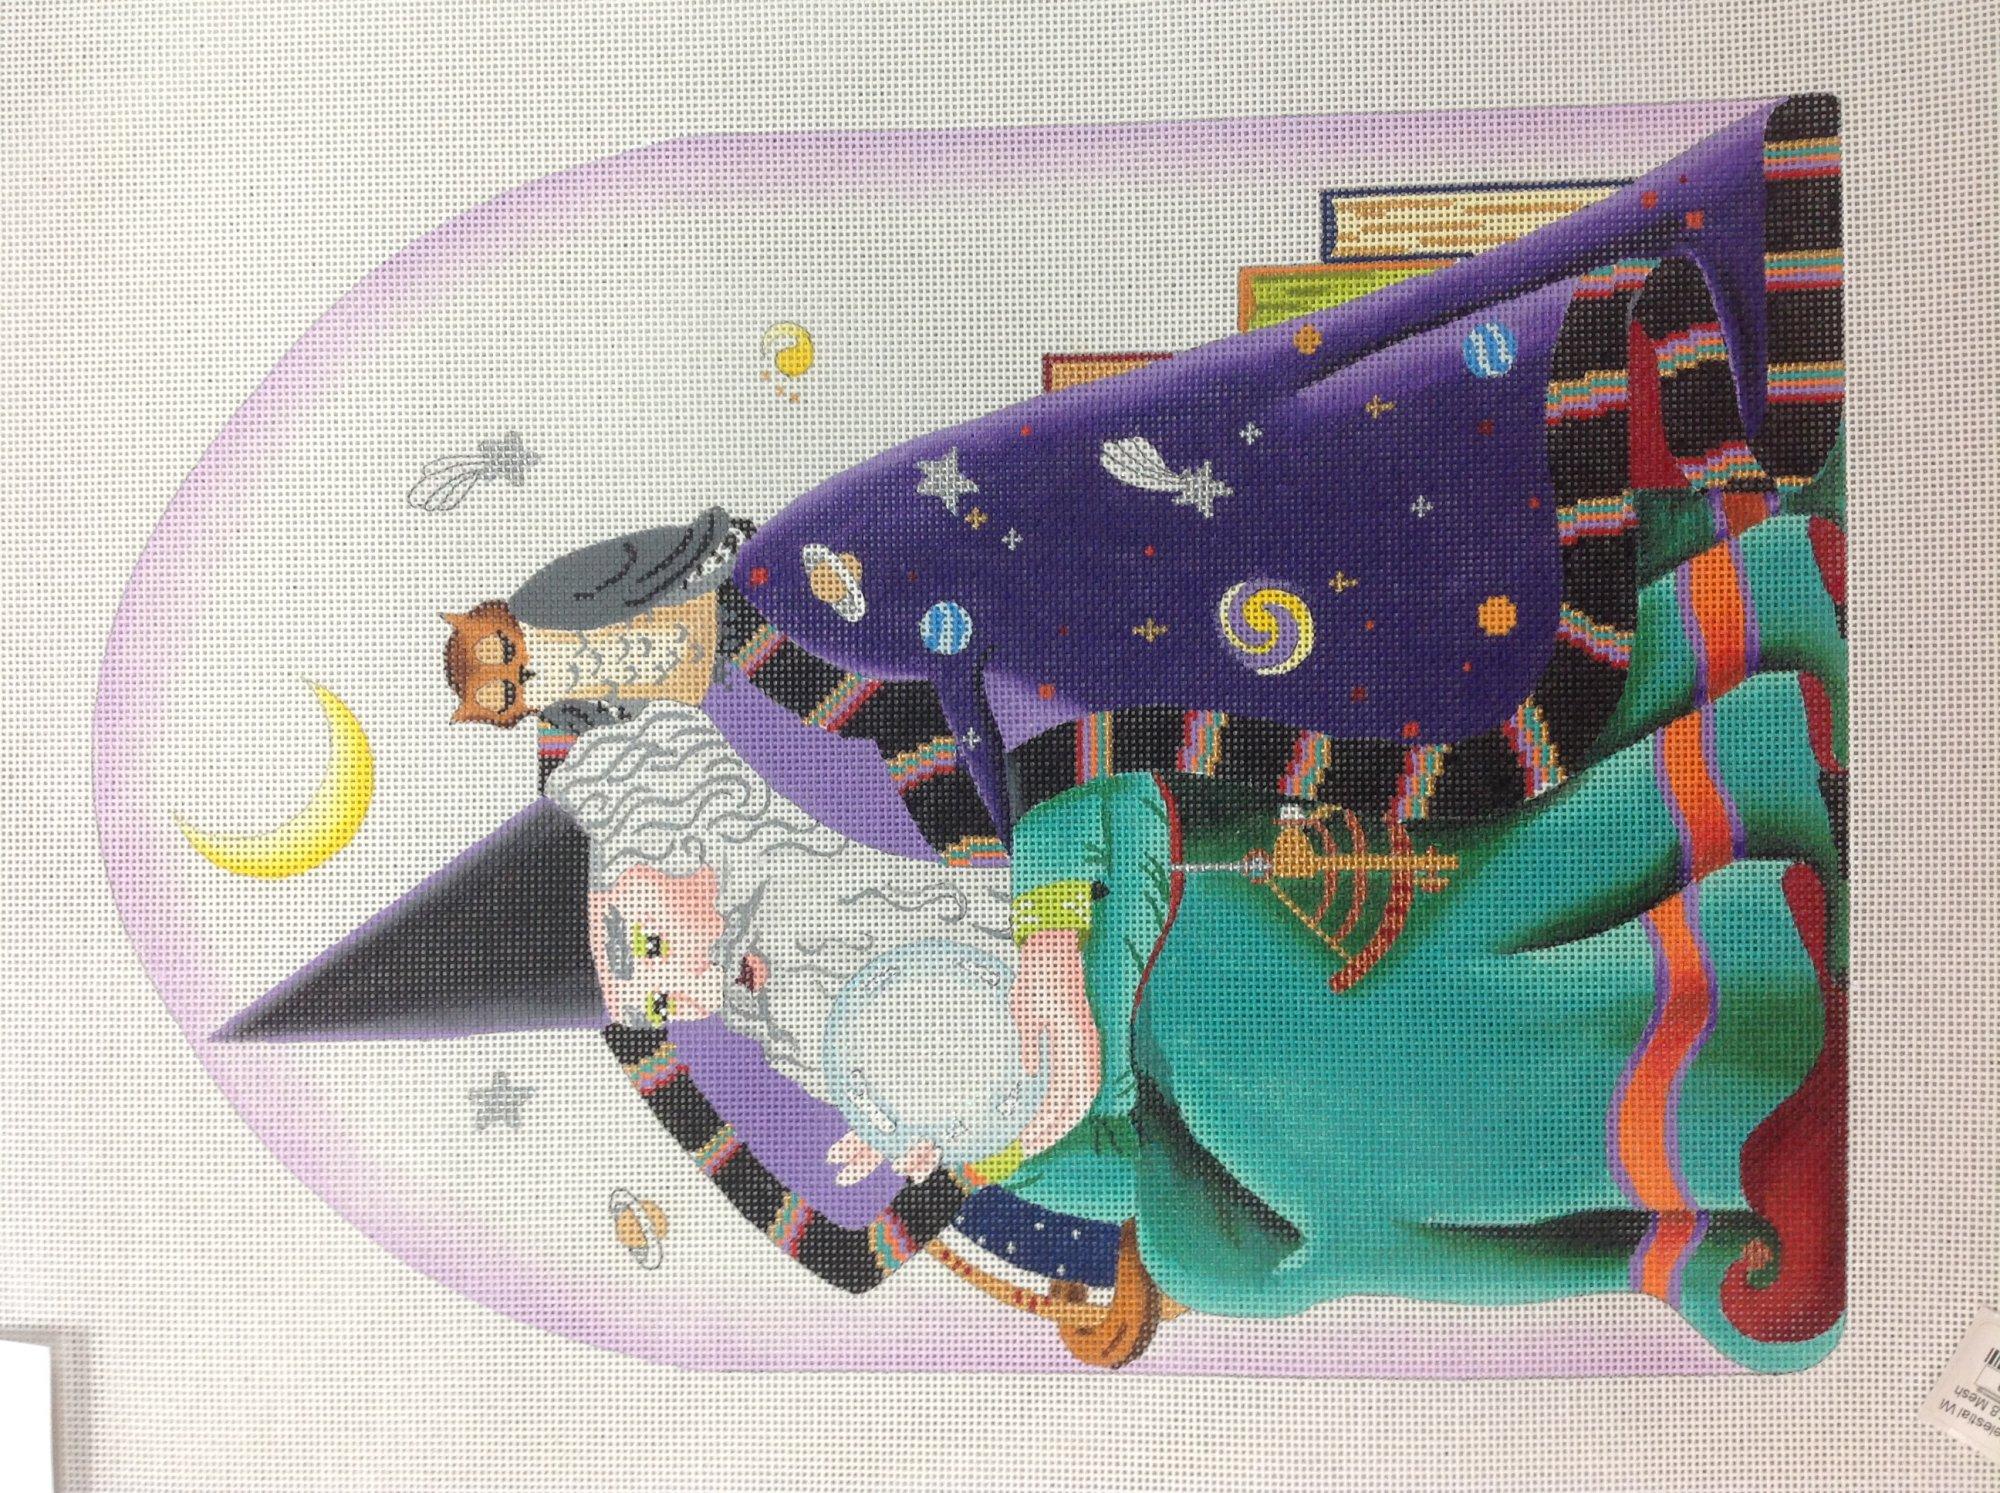 celestial wizard (2 pieces)**